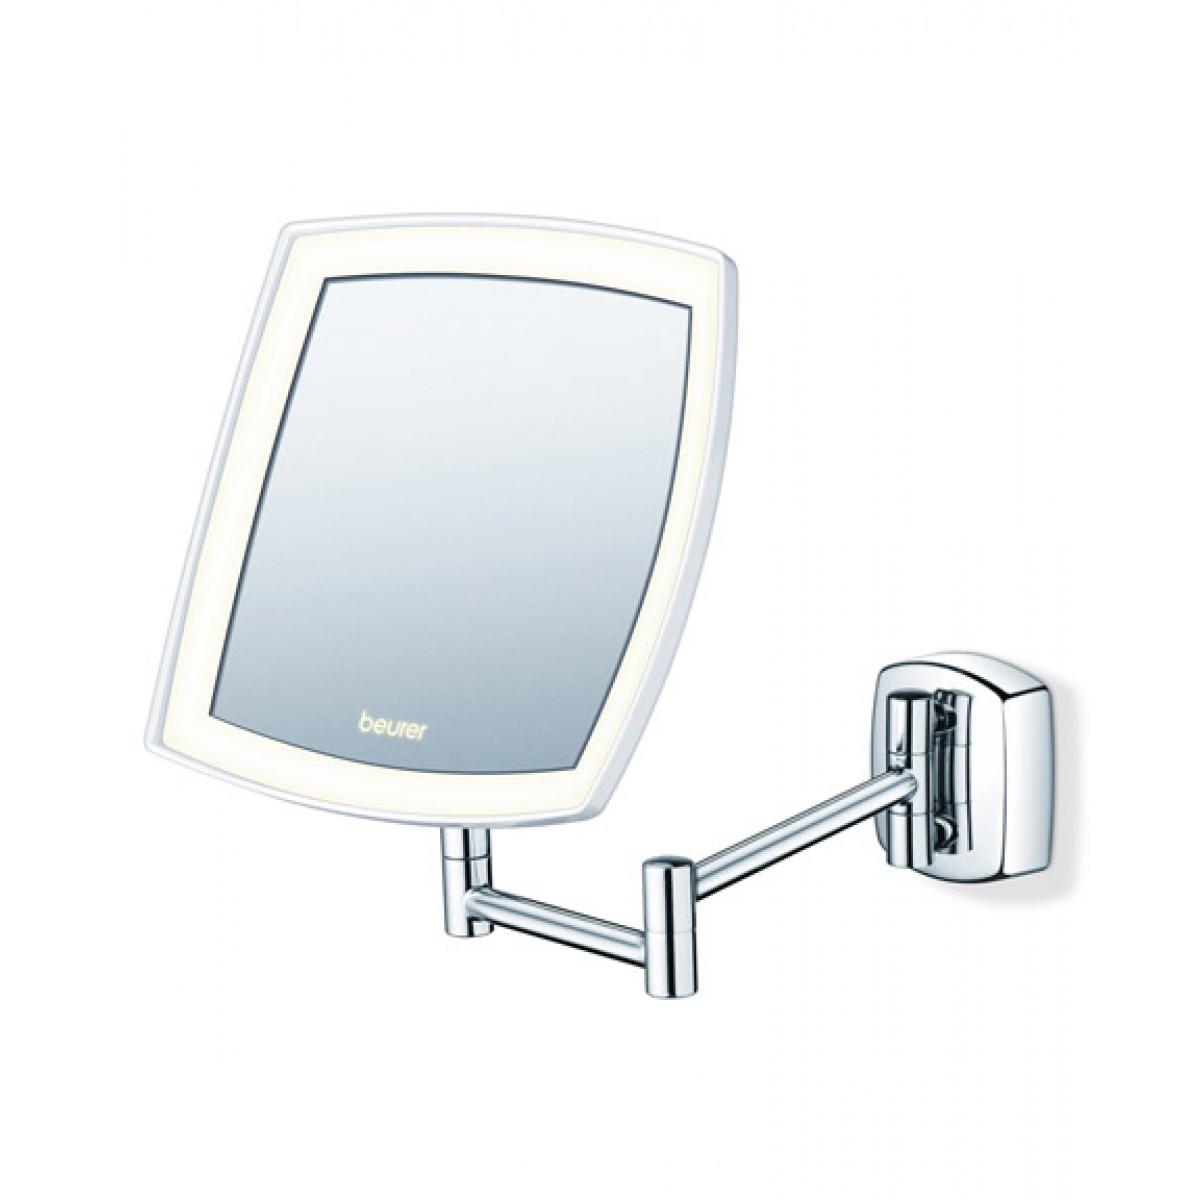 Beurer Illuminated Cosmetic Mirror (BS-89)